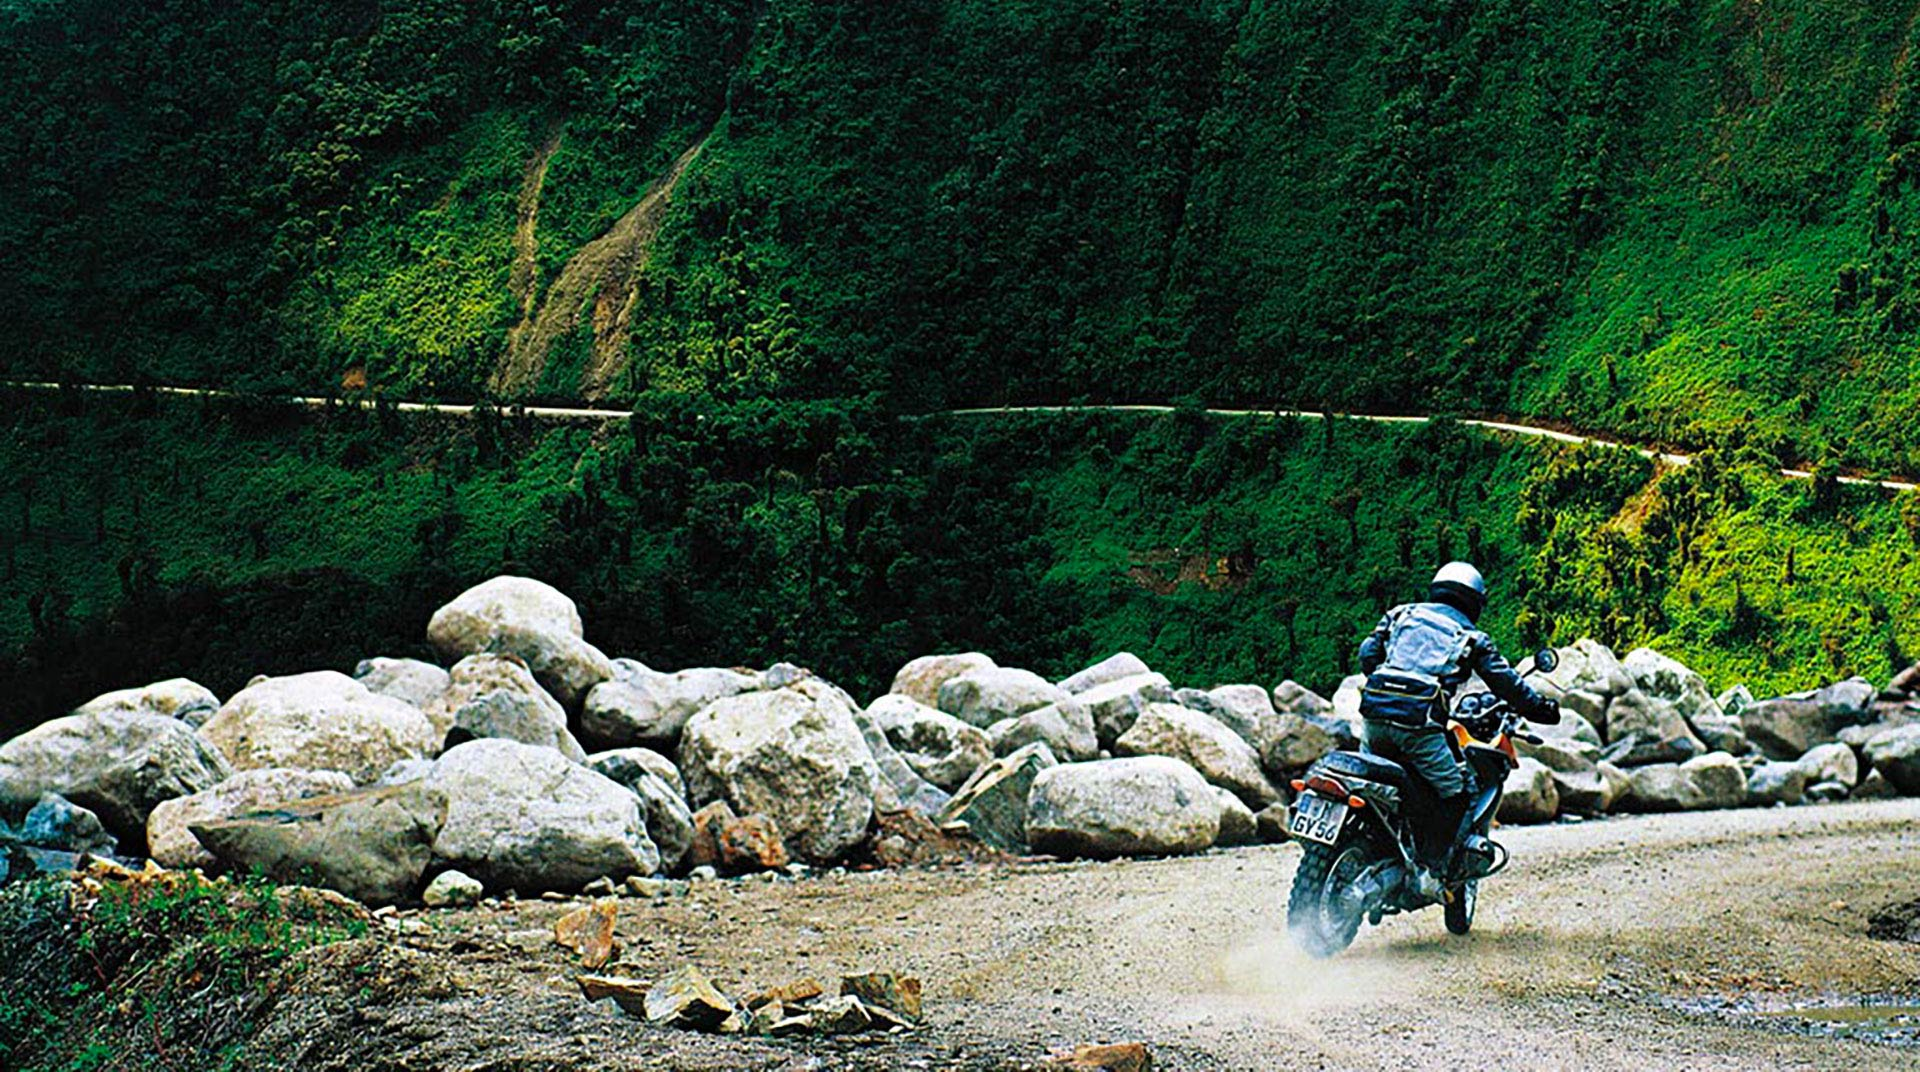 Ricambi BMW motorrad